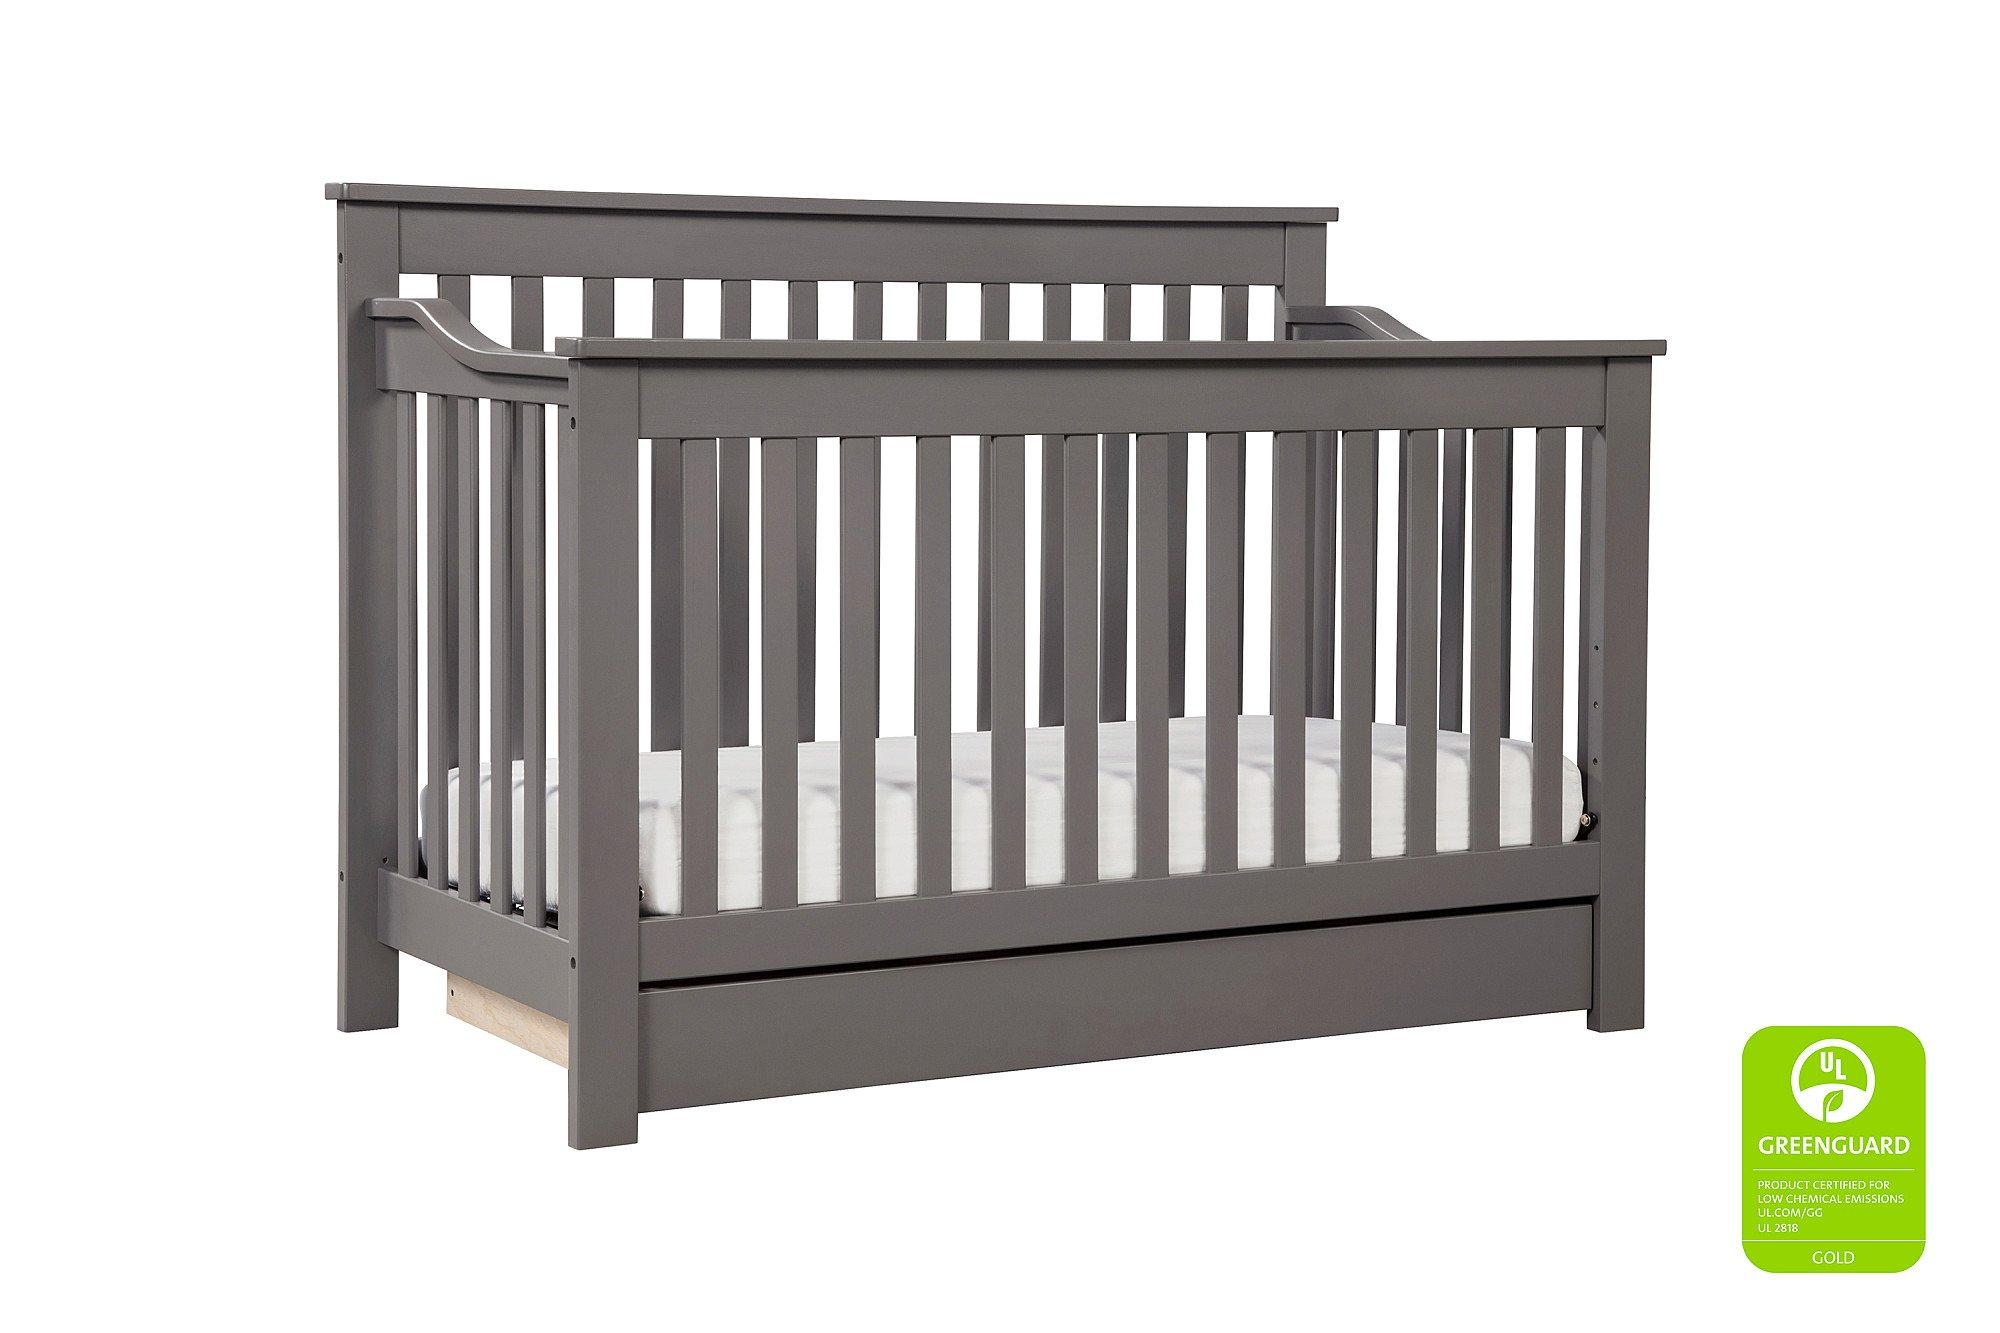 DaVinci Piedmont 4-in-1 Crib Full Size Conversion Kit Bed Rails - Slate